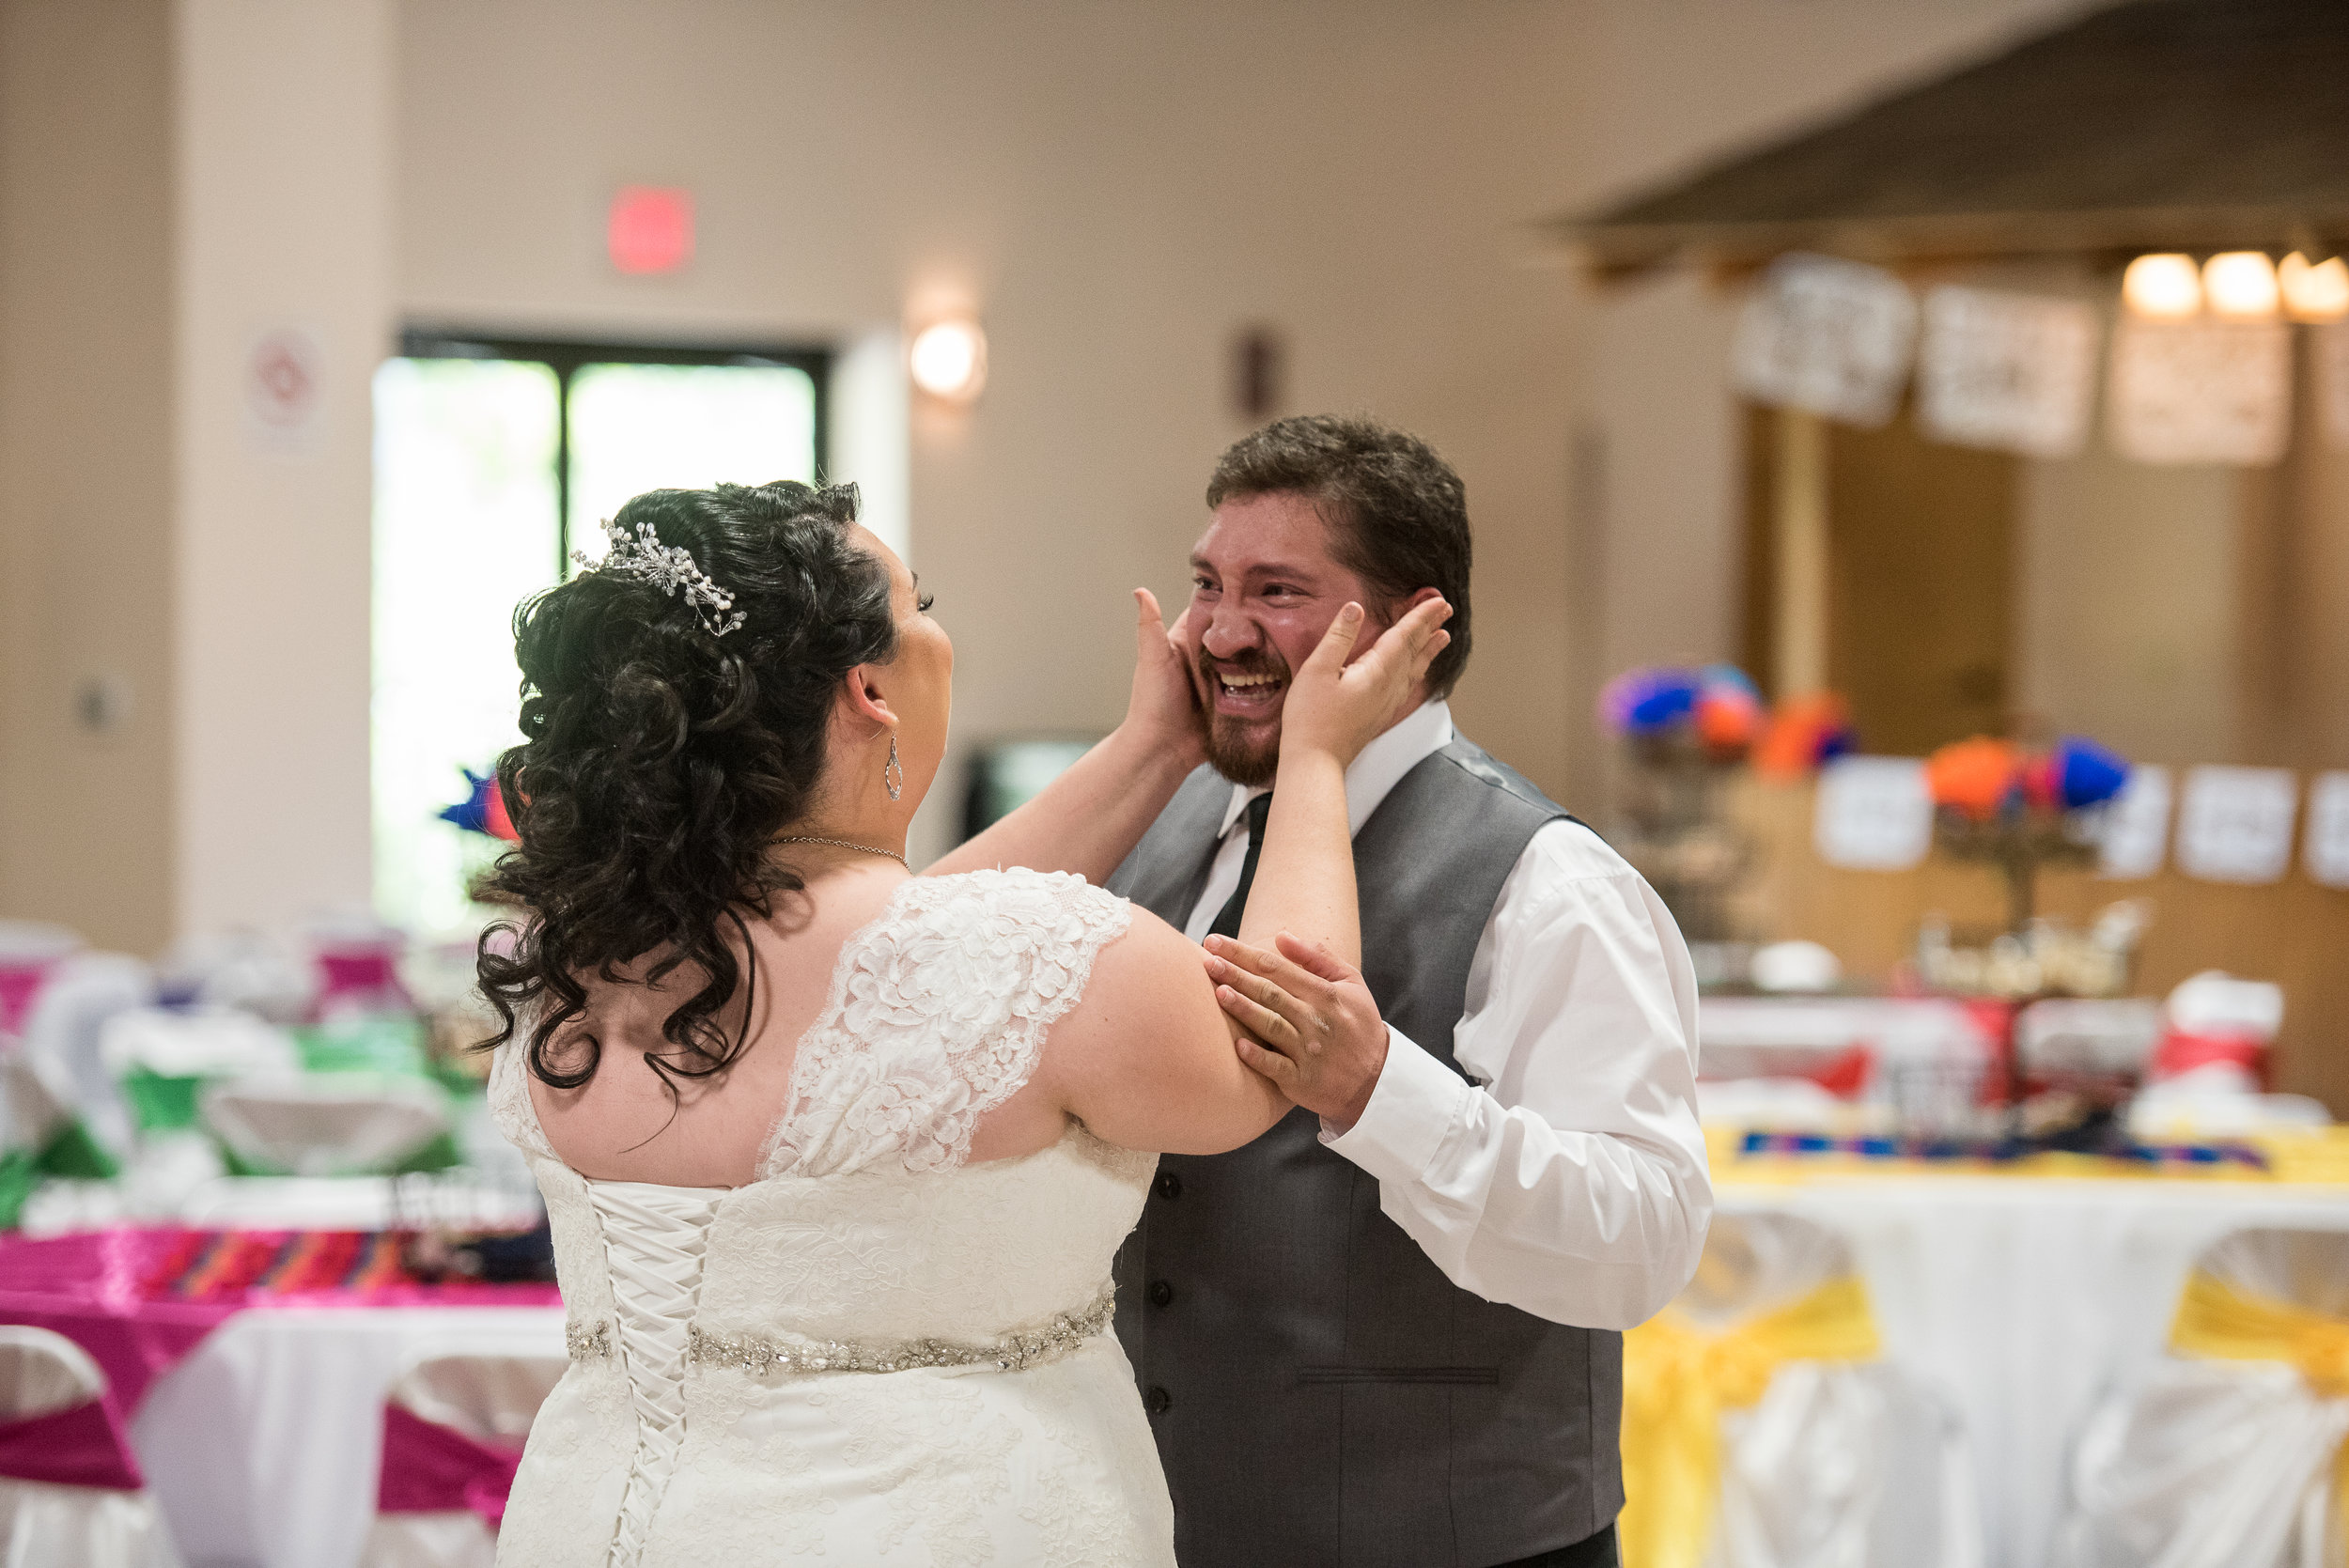 Leal Wedding Mira Visu Photography-268.jpg